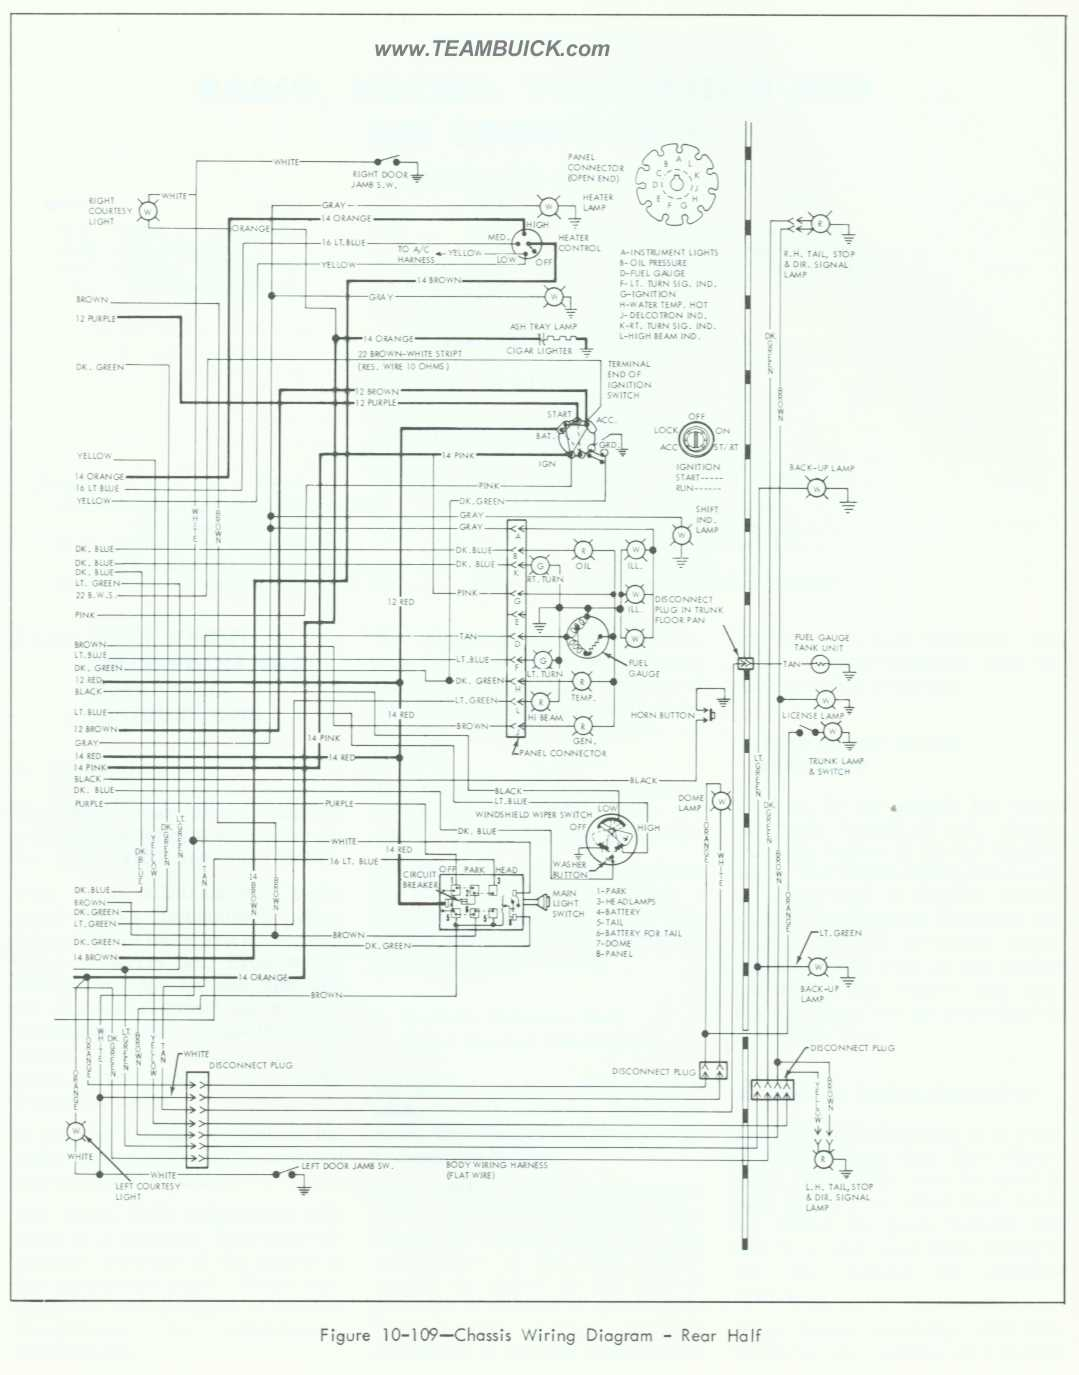 1964 buick special skylark wiring diagram rear half rh teambuick com 96 Buick  LeSabre Wiring-